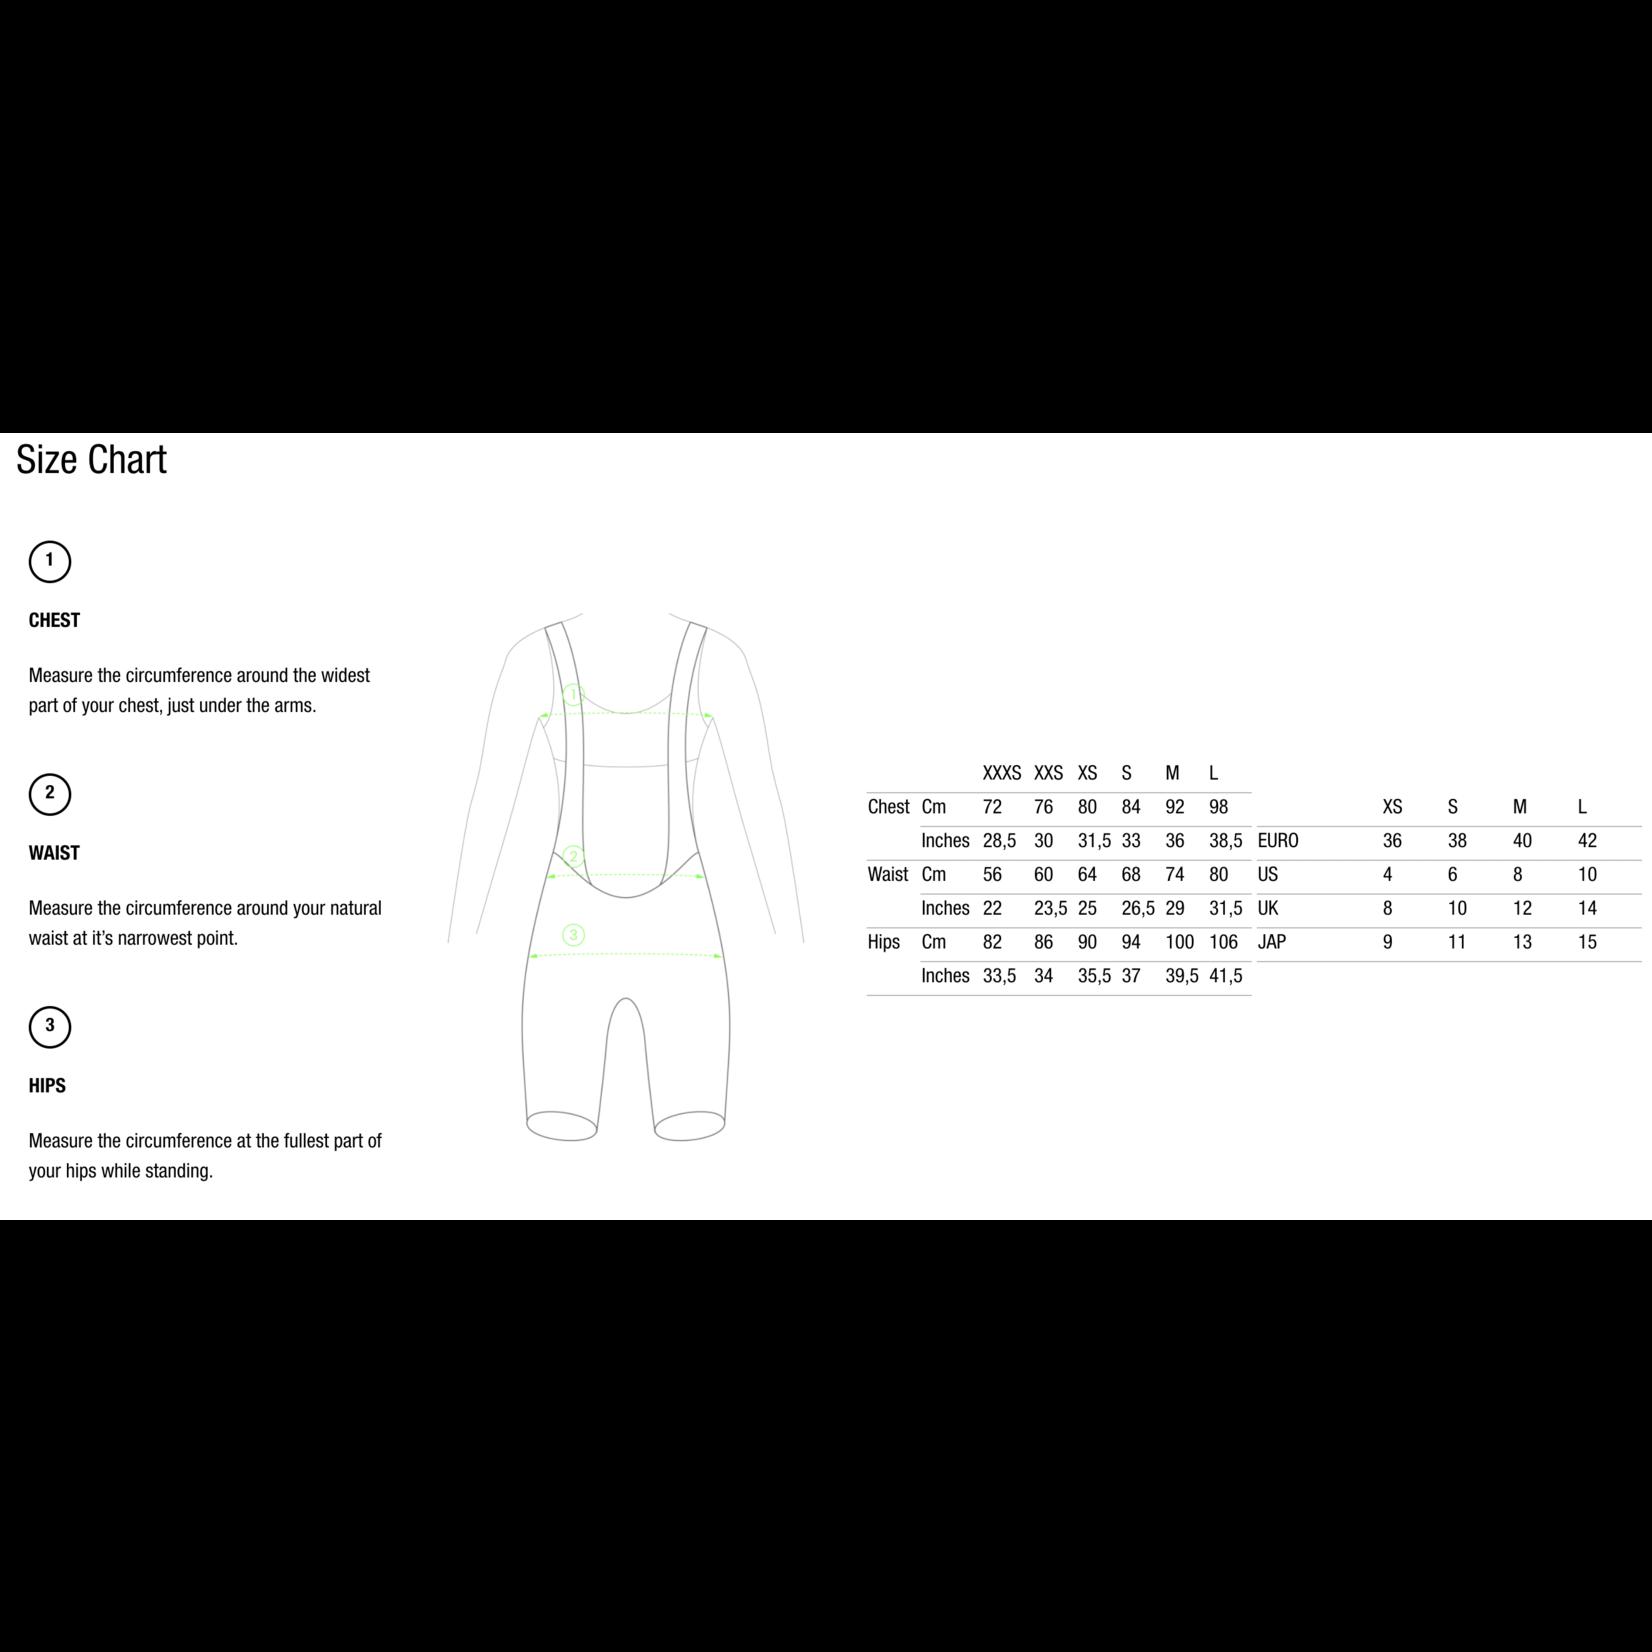 Q36.5 Q36.5 Women Long Sleeve Jersey L1 Pinstripe X - Black